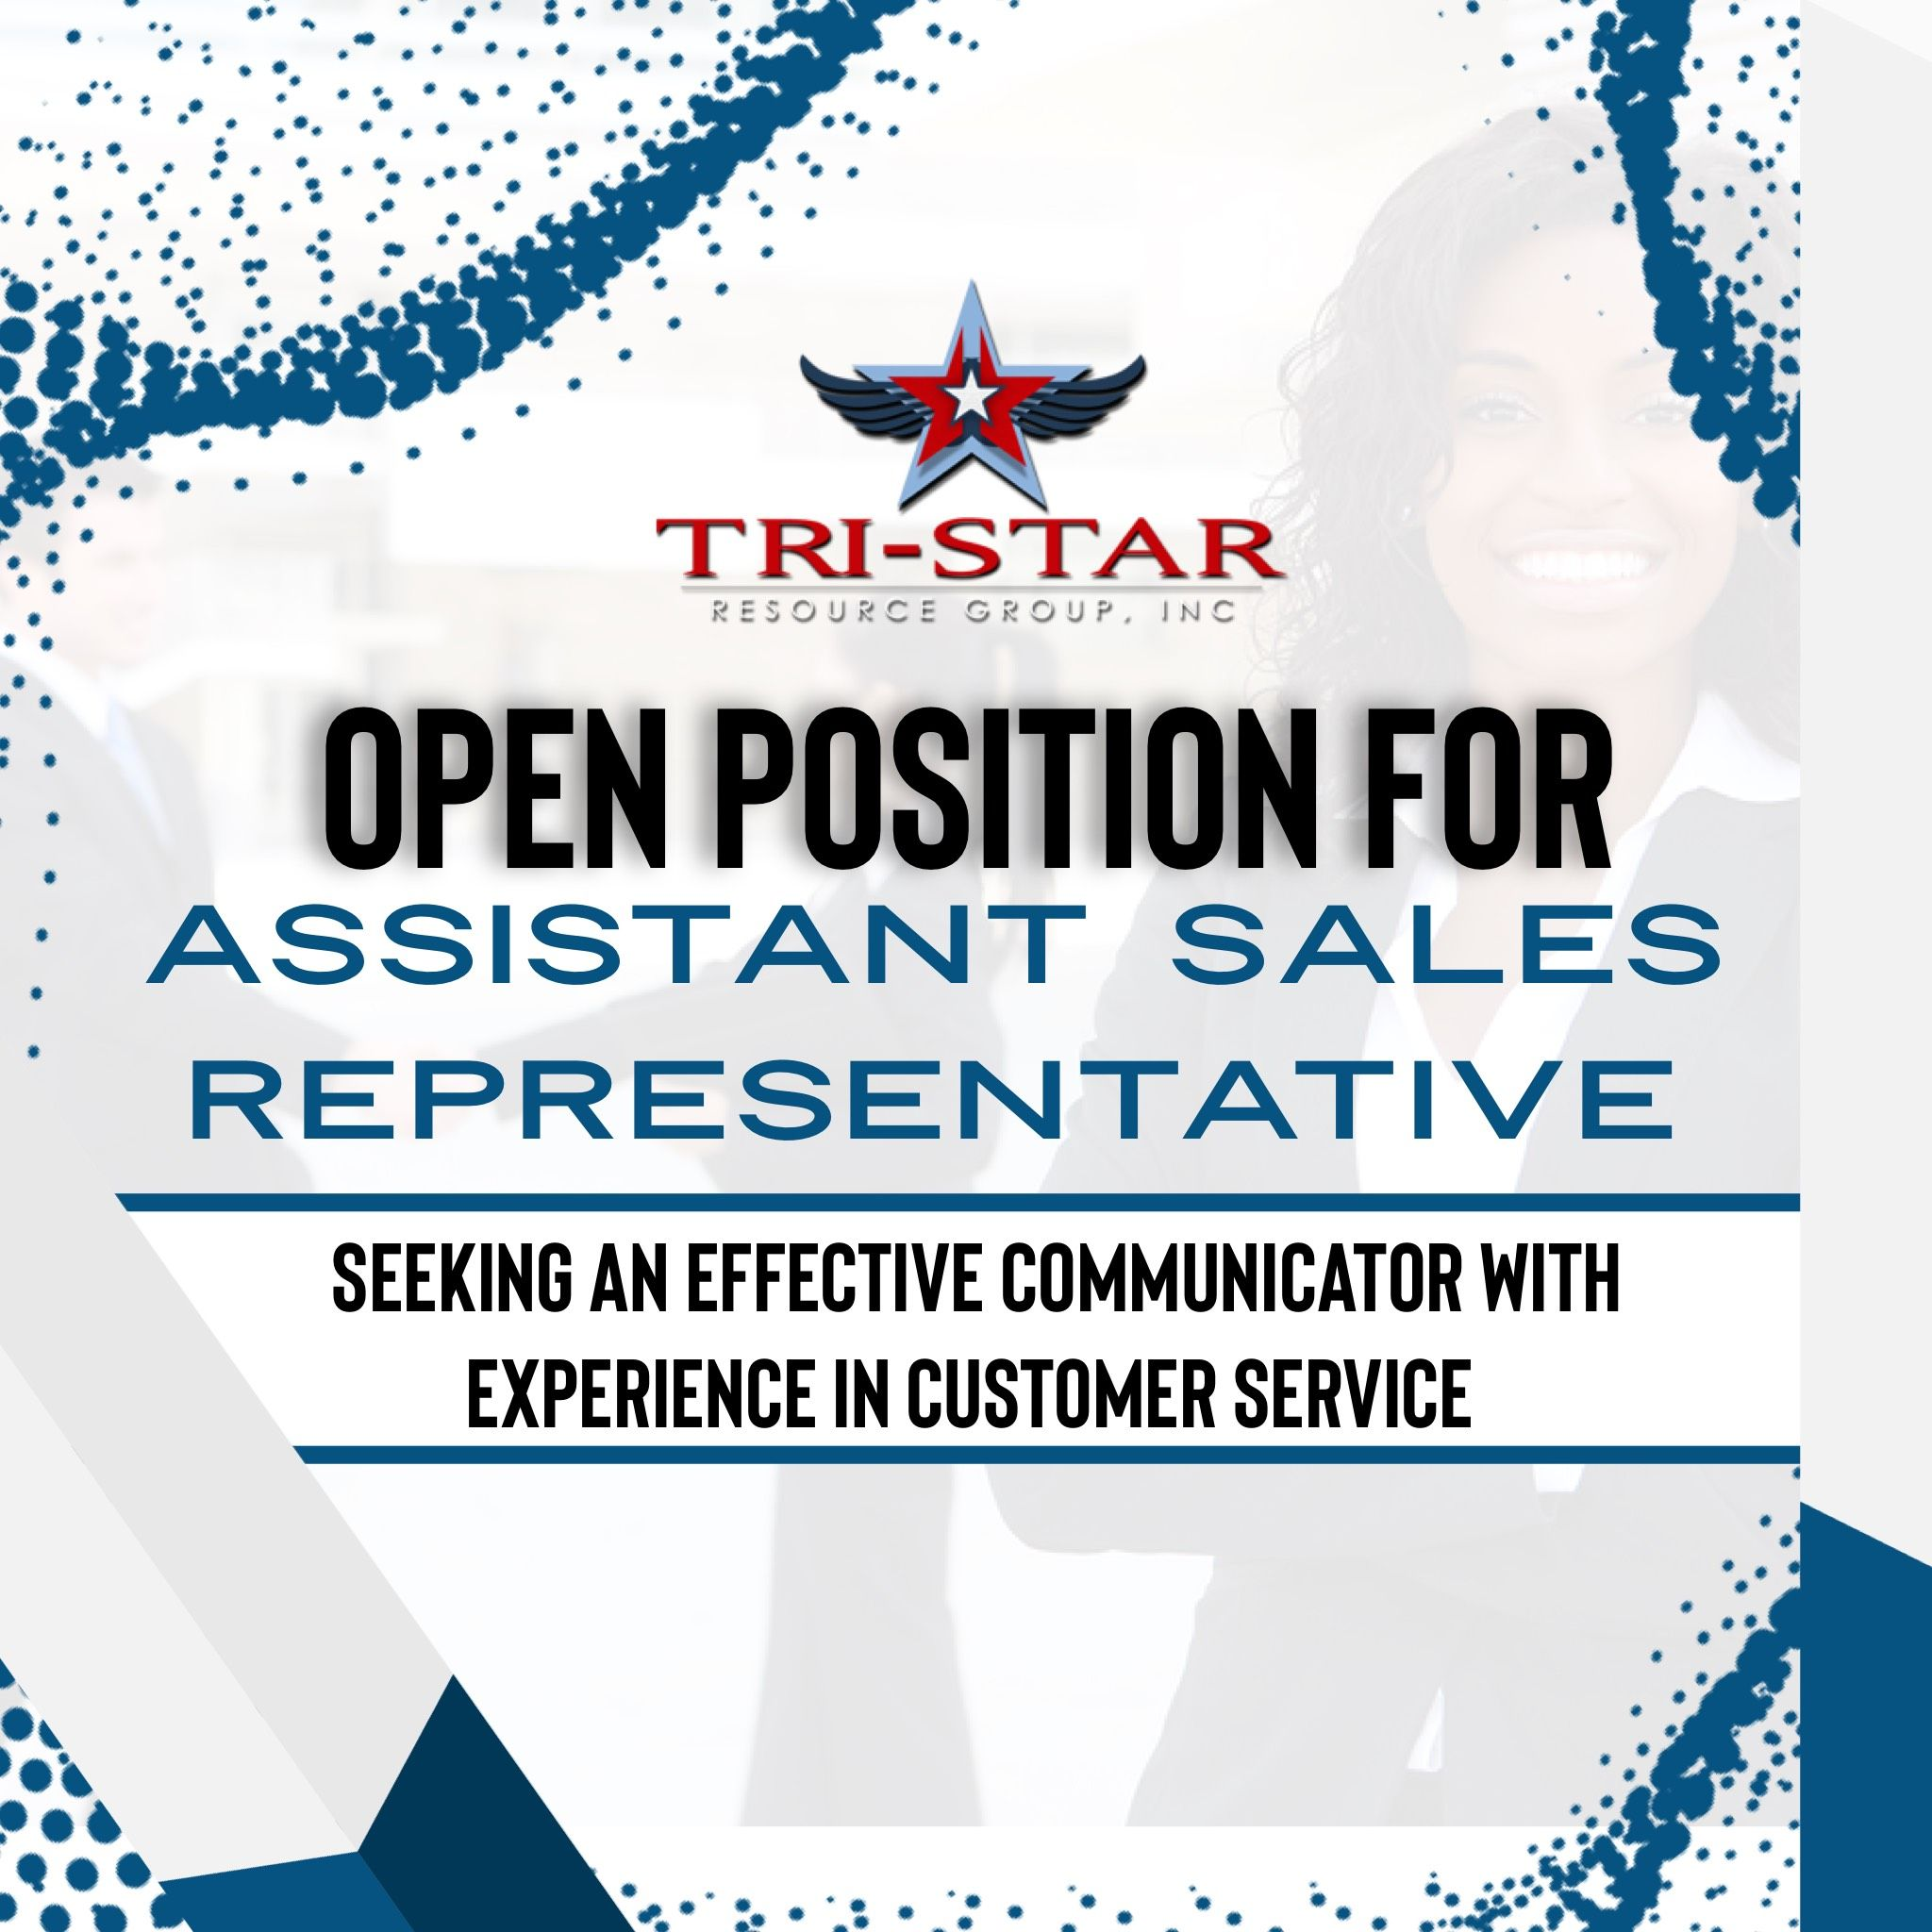 New job opening tristar resource group inc is seeking